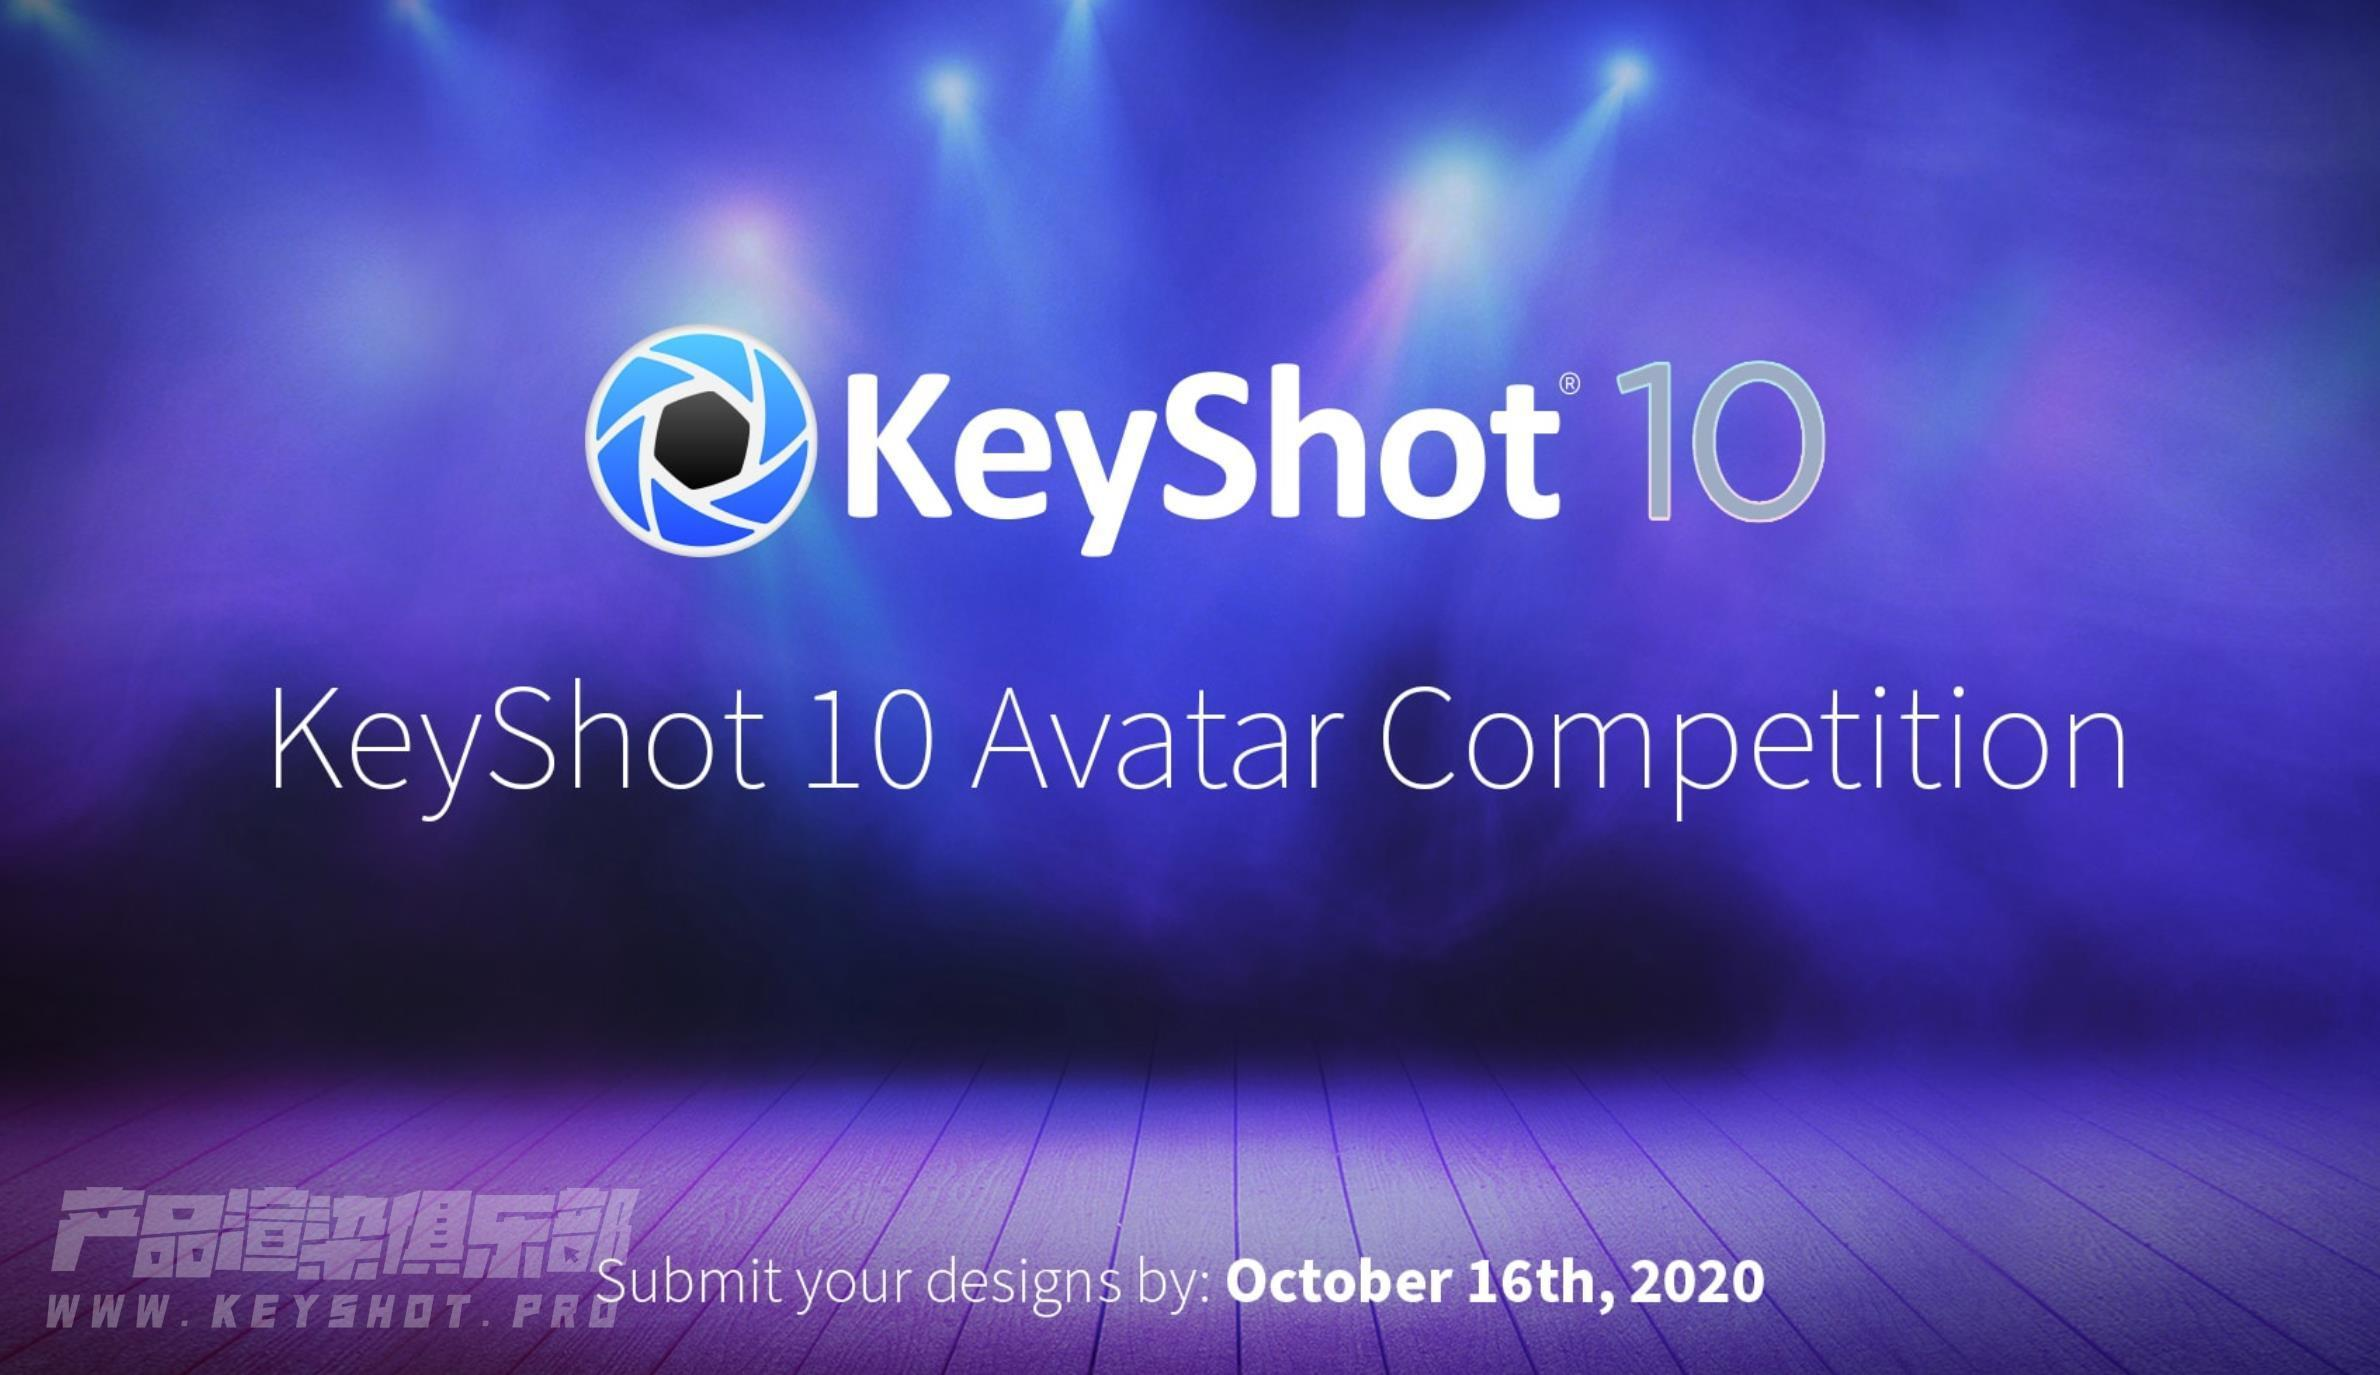 KeyShot 10 Avatar竞赛指南